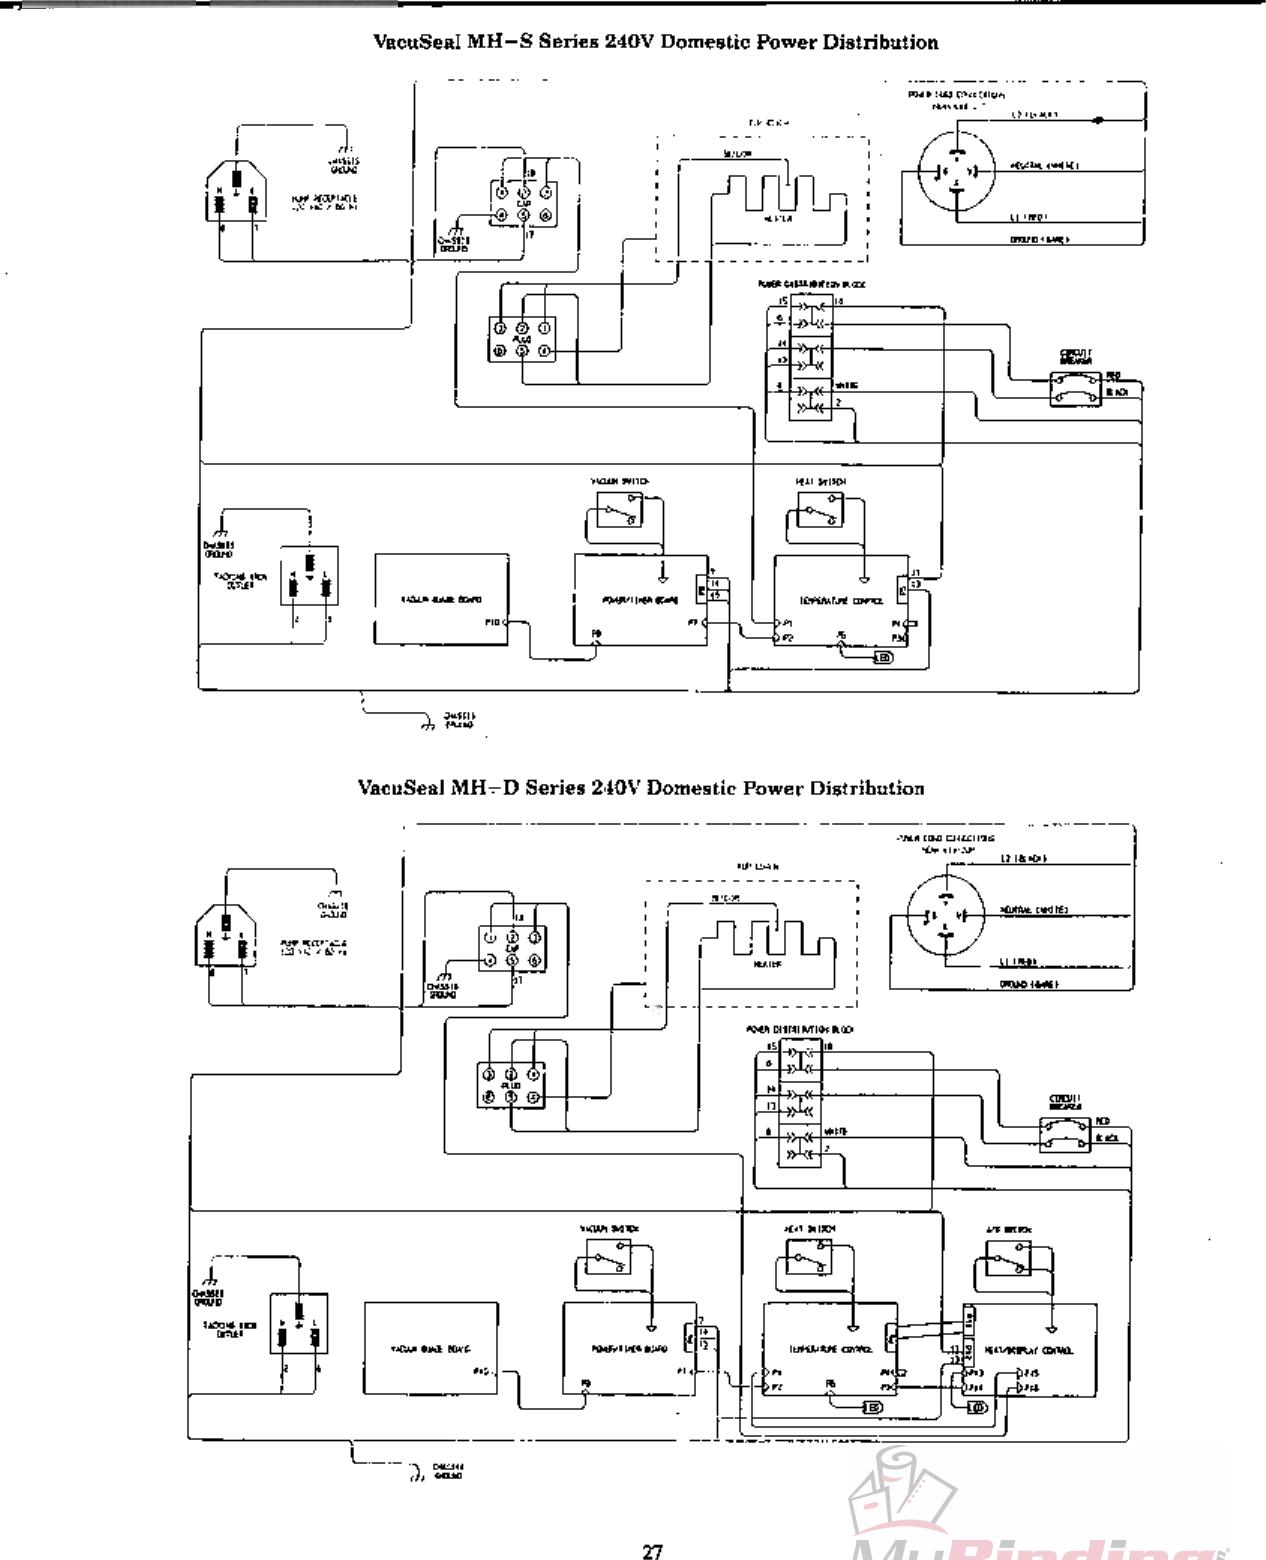 MyBinding Vacuseal Mhd Mhs Wiring User Manual Vacu Seal